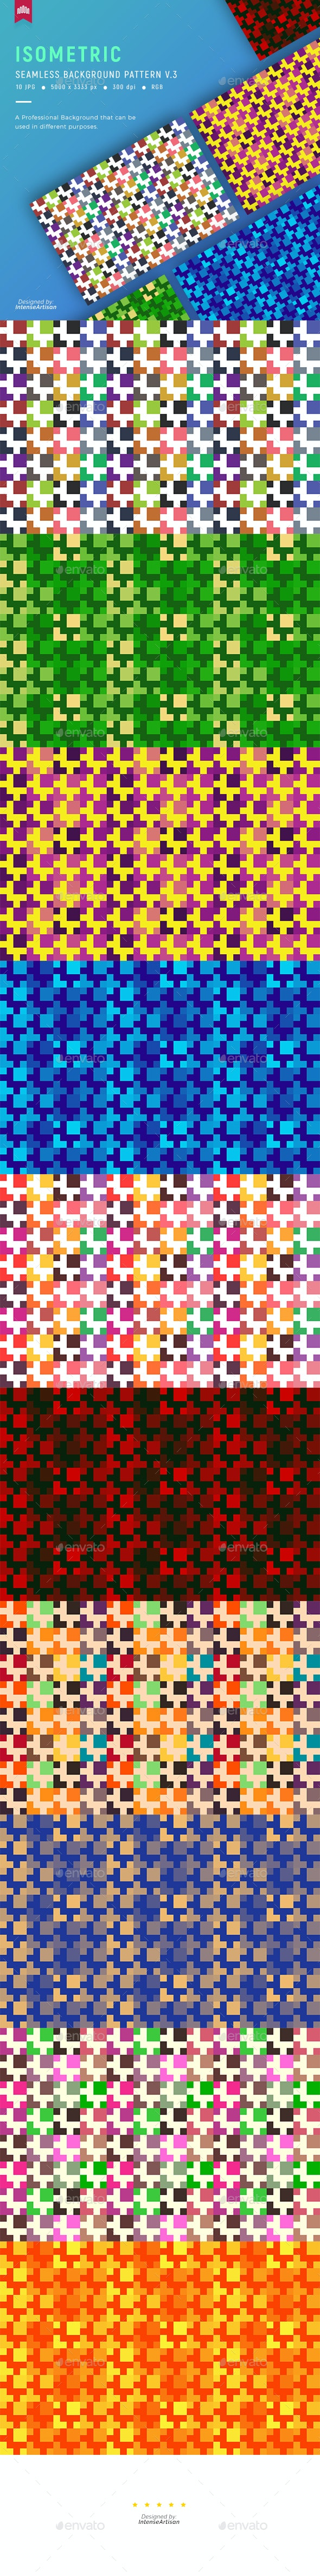 Isometric Seamless Pattern Background V.3 - Patterns Backgrounds